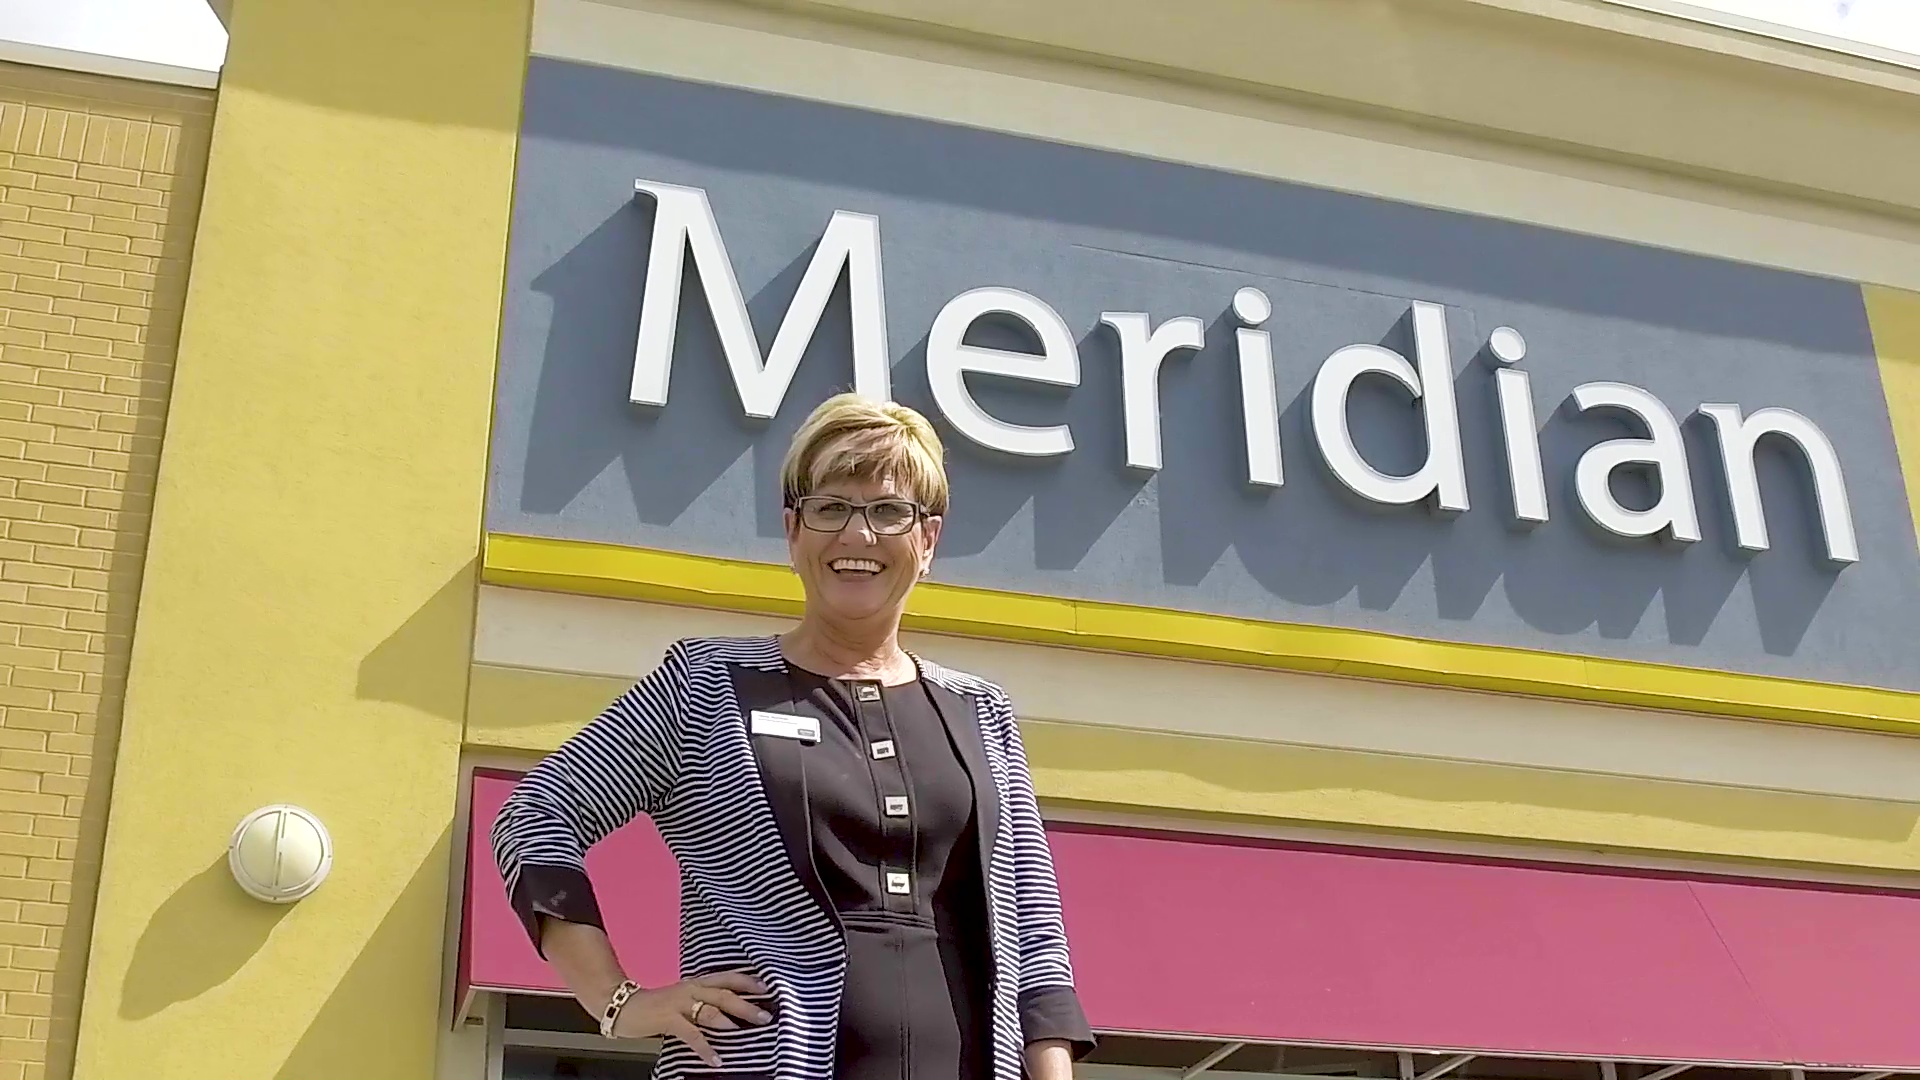 Cindy Vertlieb – Meridian Credit Union